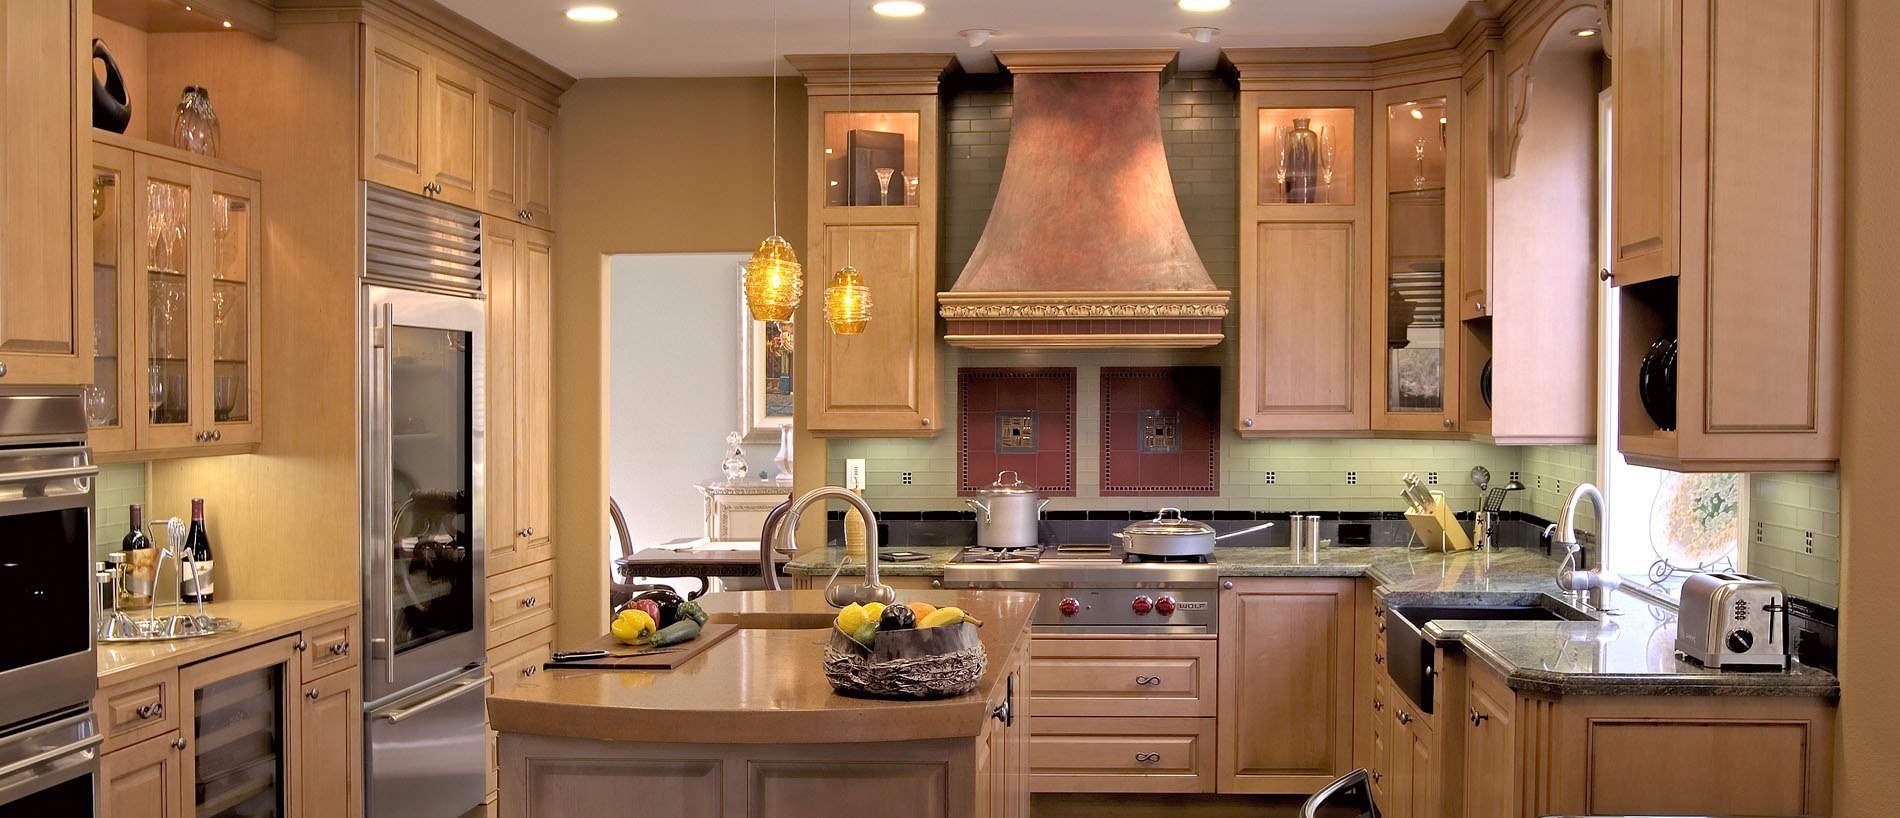 kitchen design with custom hood